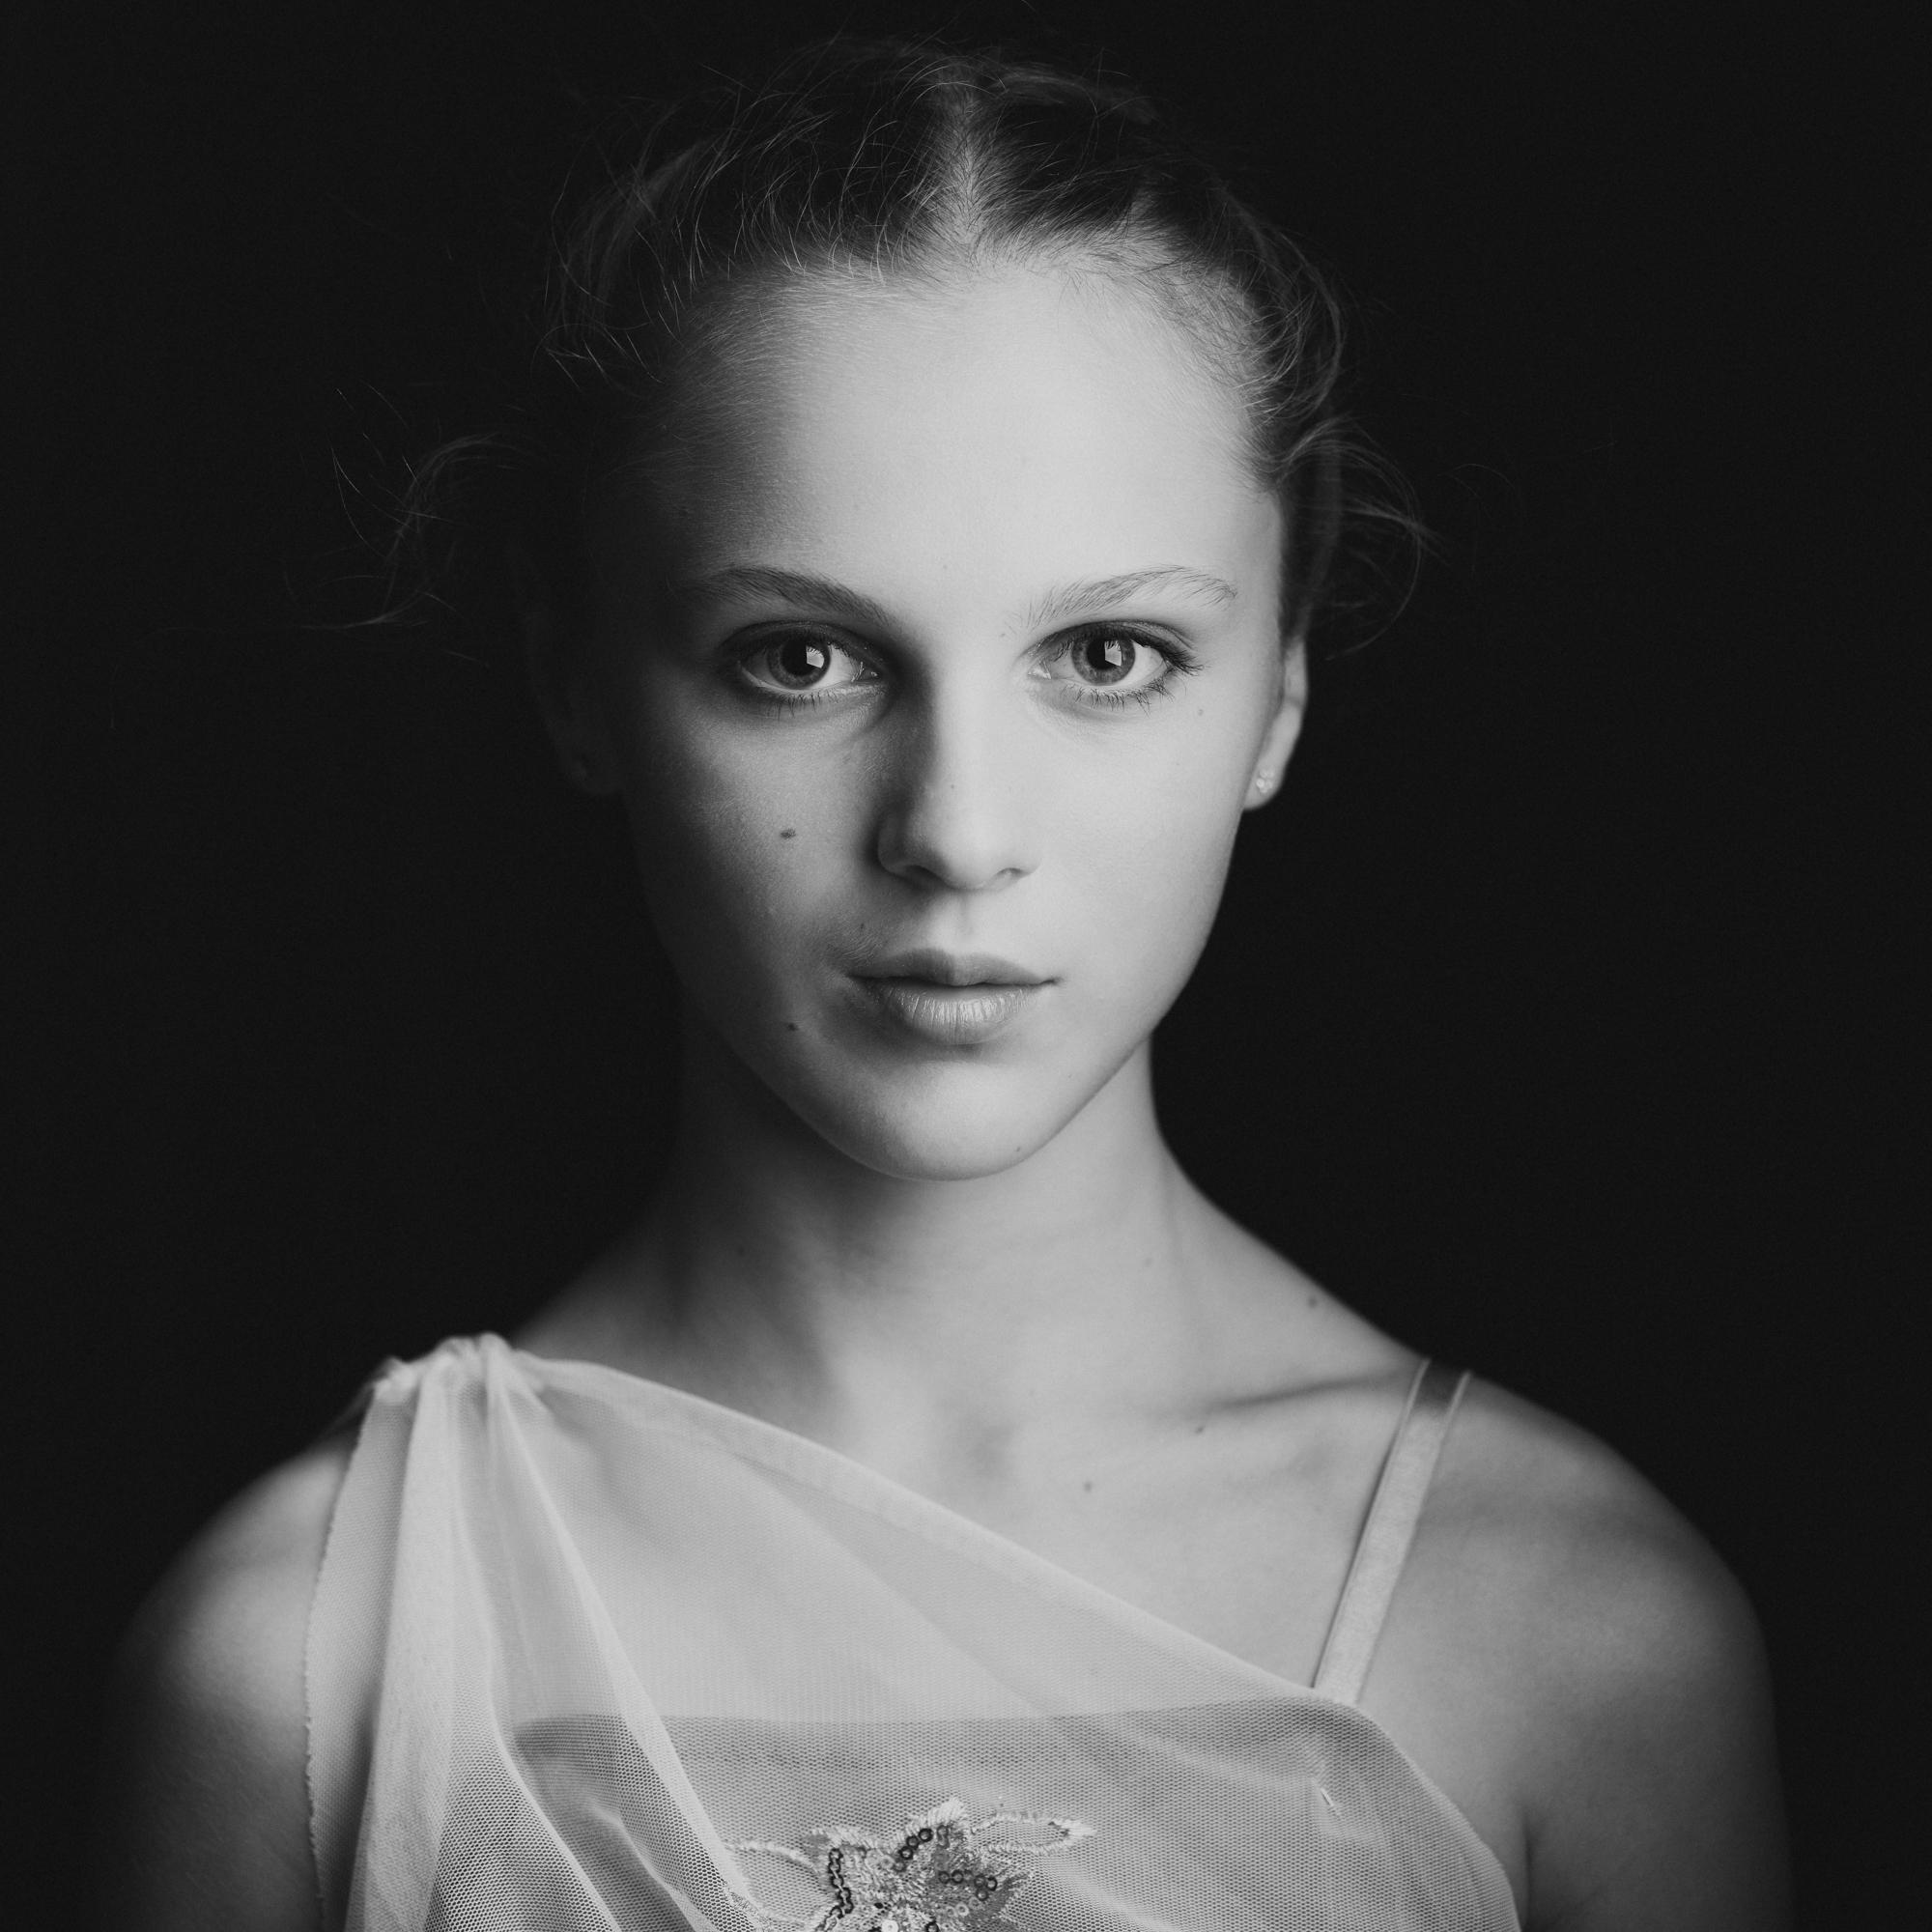 Susannah-003.jpg